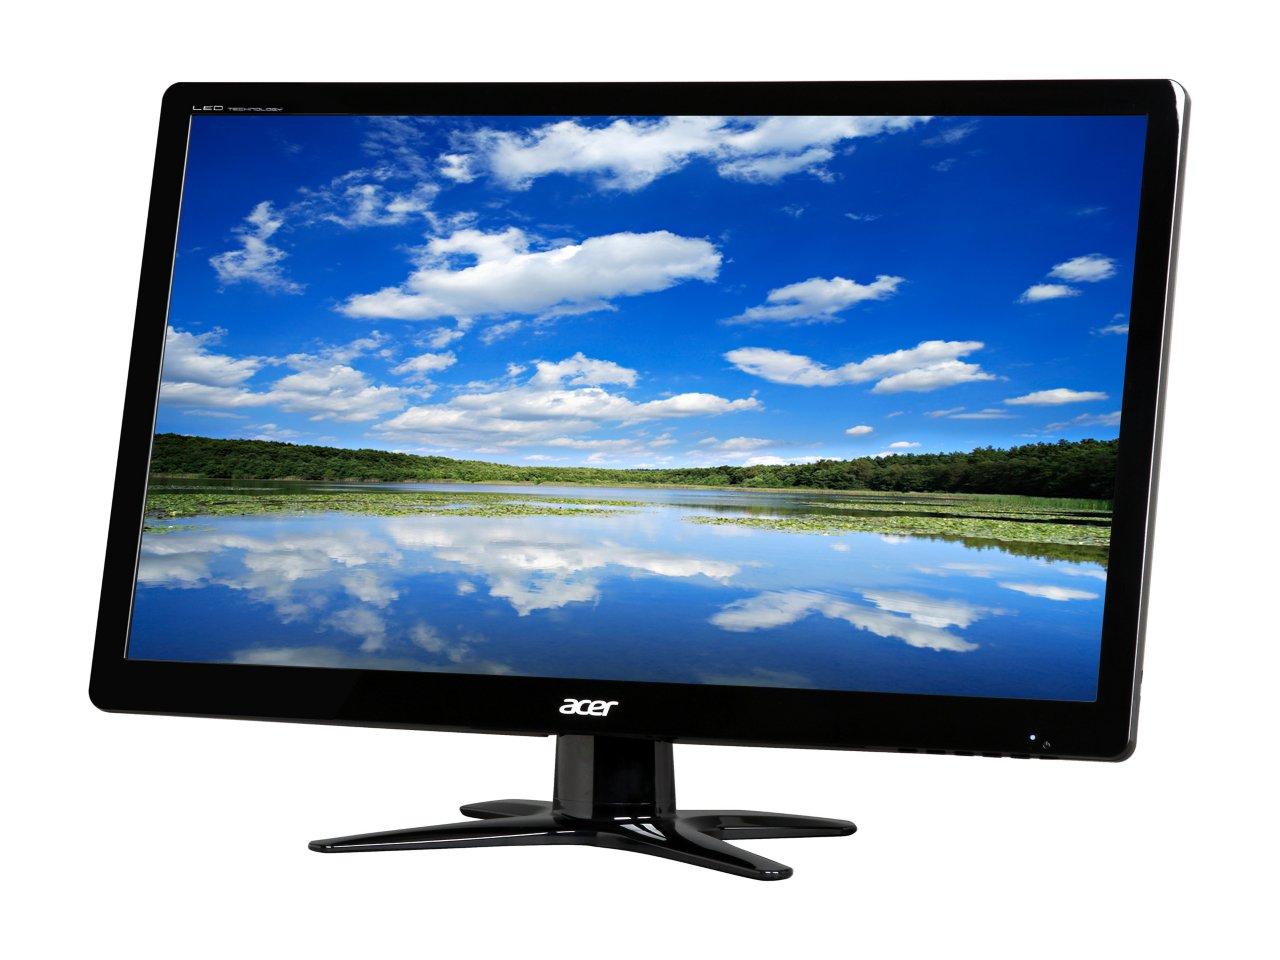 "23"" Acer G6 Series Black 1920x1080 5ms TN Panel LED Monitor for $89.99, 24"" Acer S241HLbmid 1920x1080 5ms TN Panel HDMI LED Monitor for $109.99 + S&H & More @ Newegg.com"